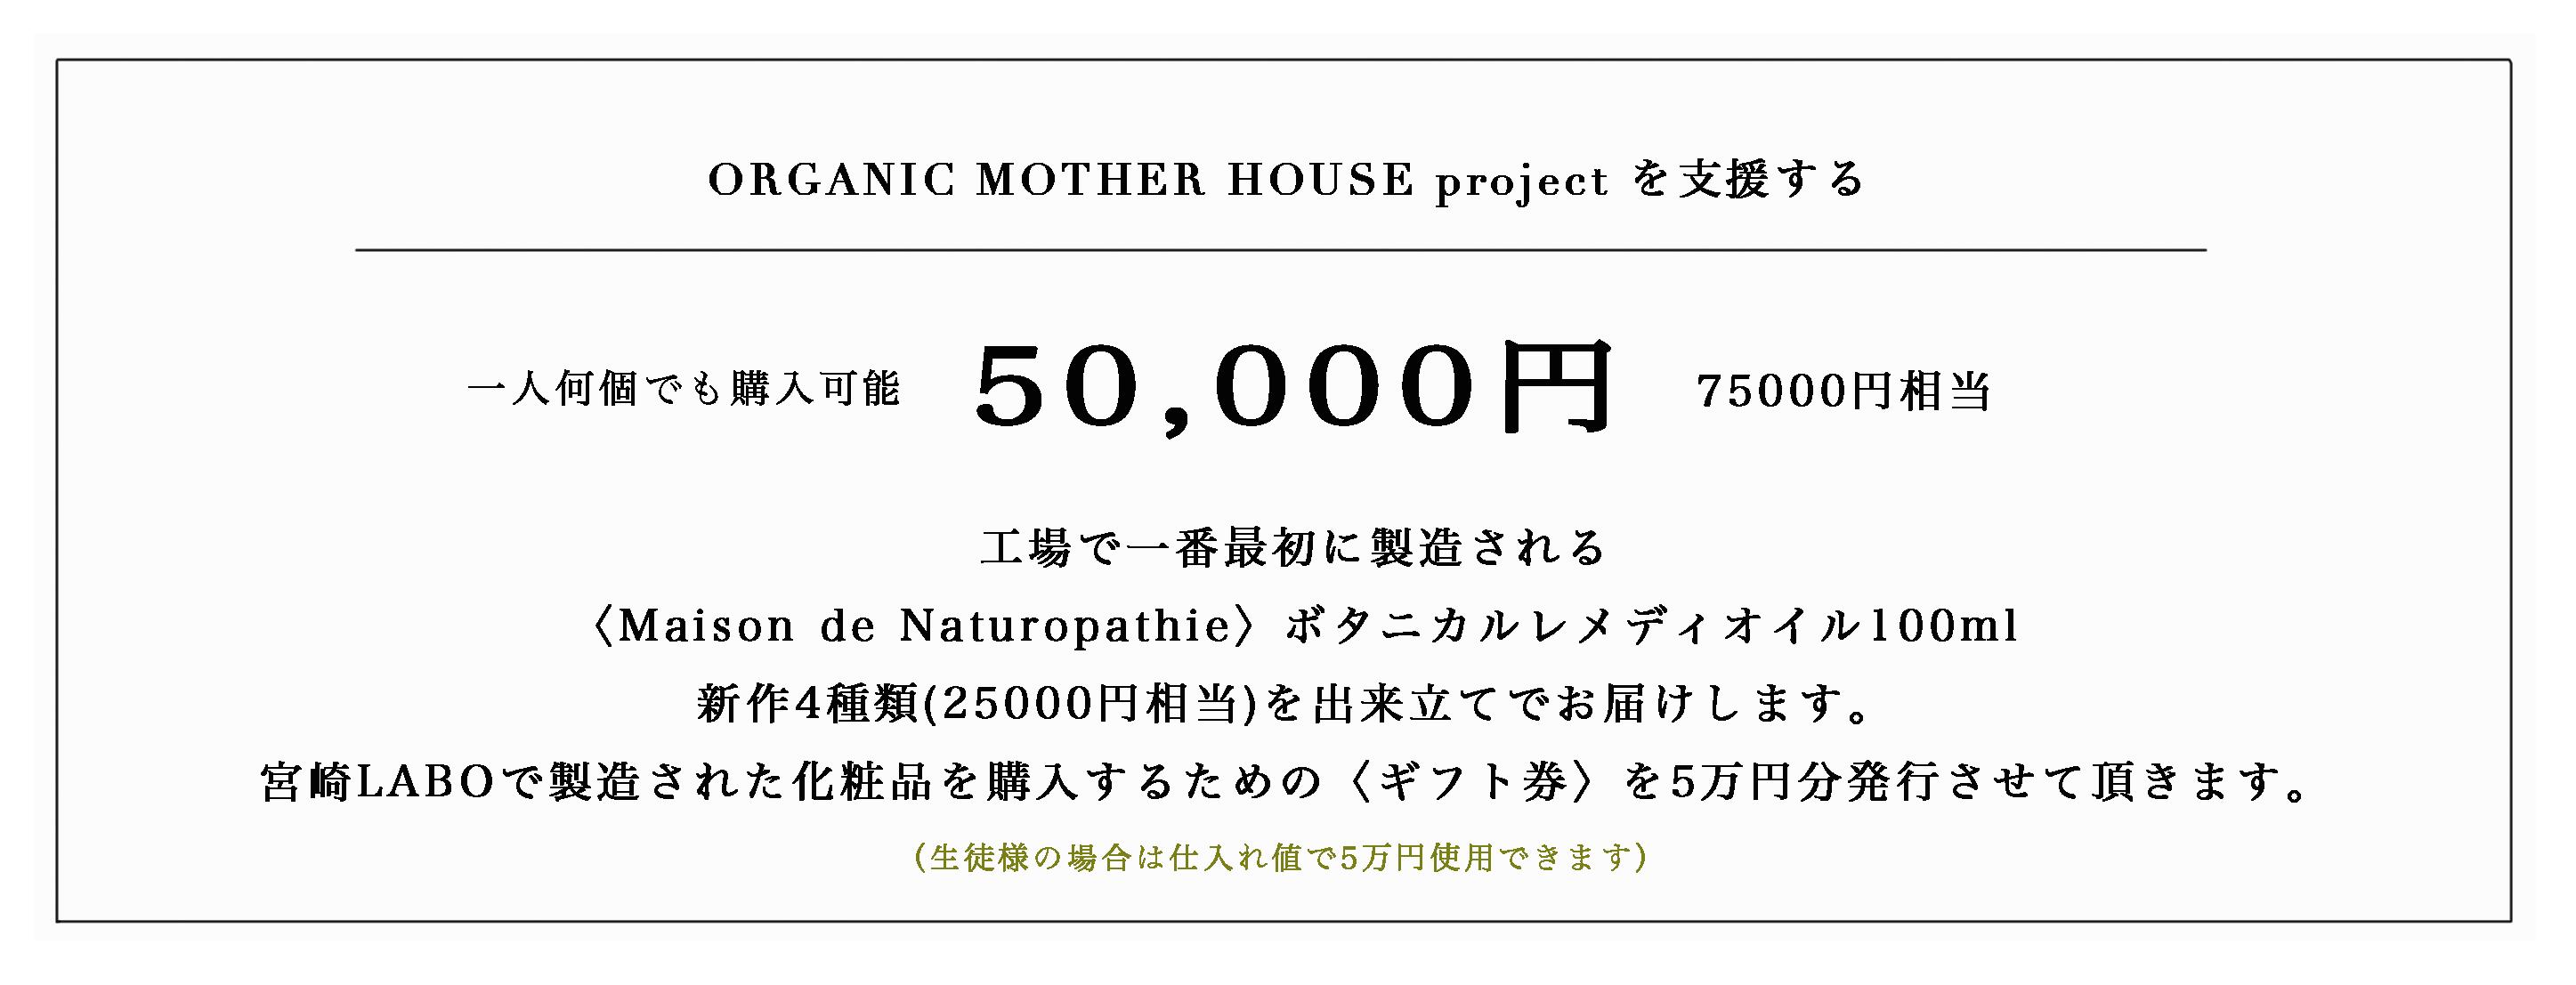 ORGANIC MOTHER HOUSE〈植物調合美容研究所〉5万2